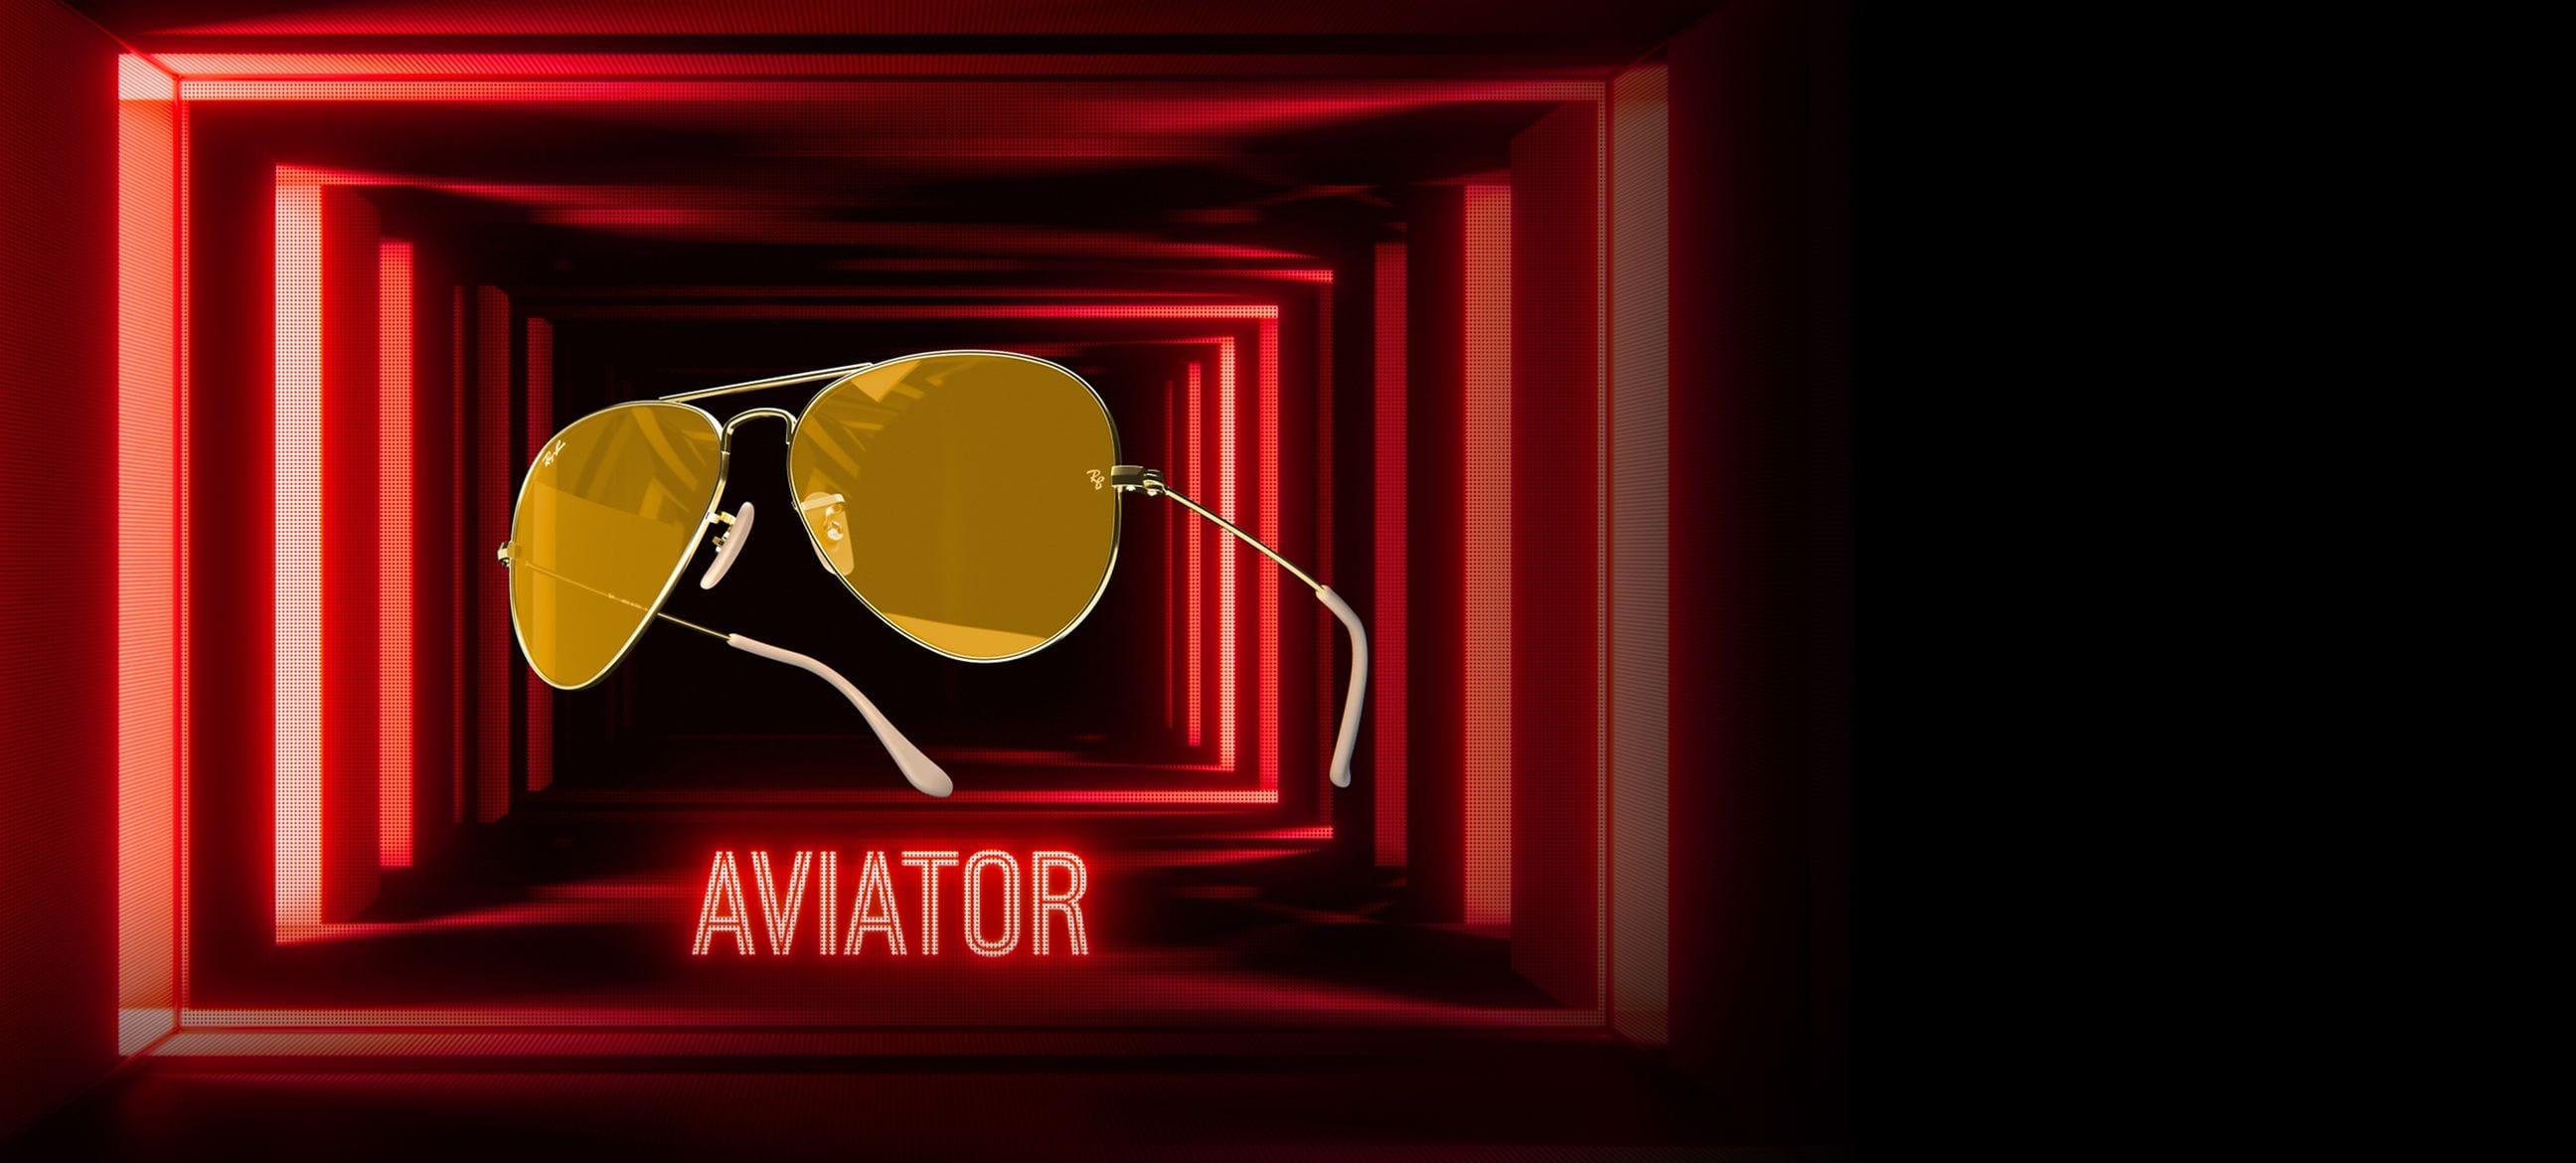 Aviator Ambermatic Ray-Ban Limited